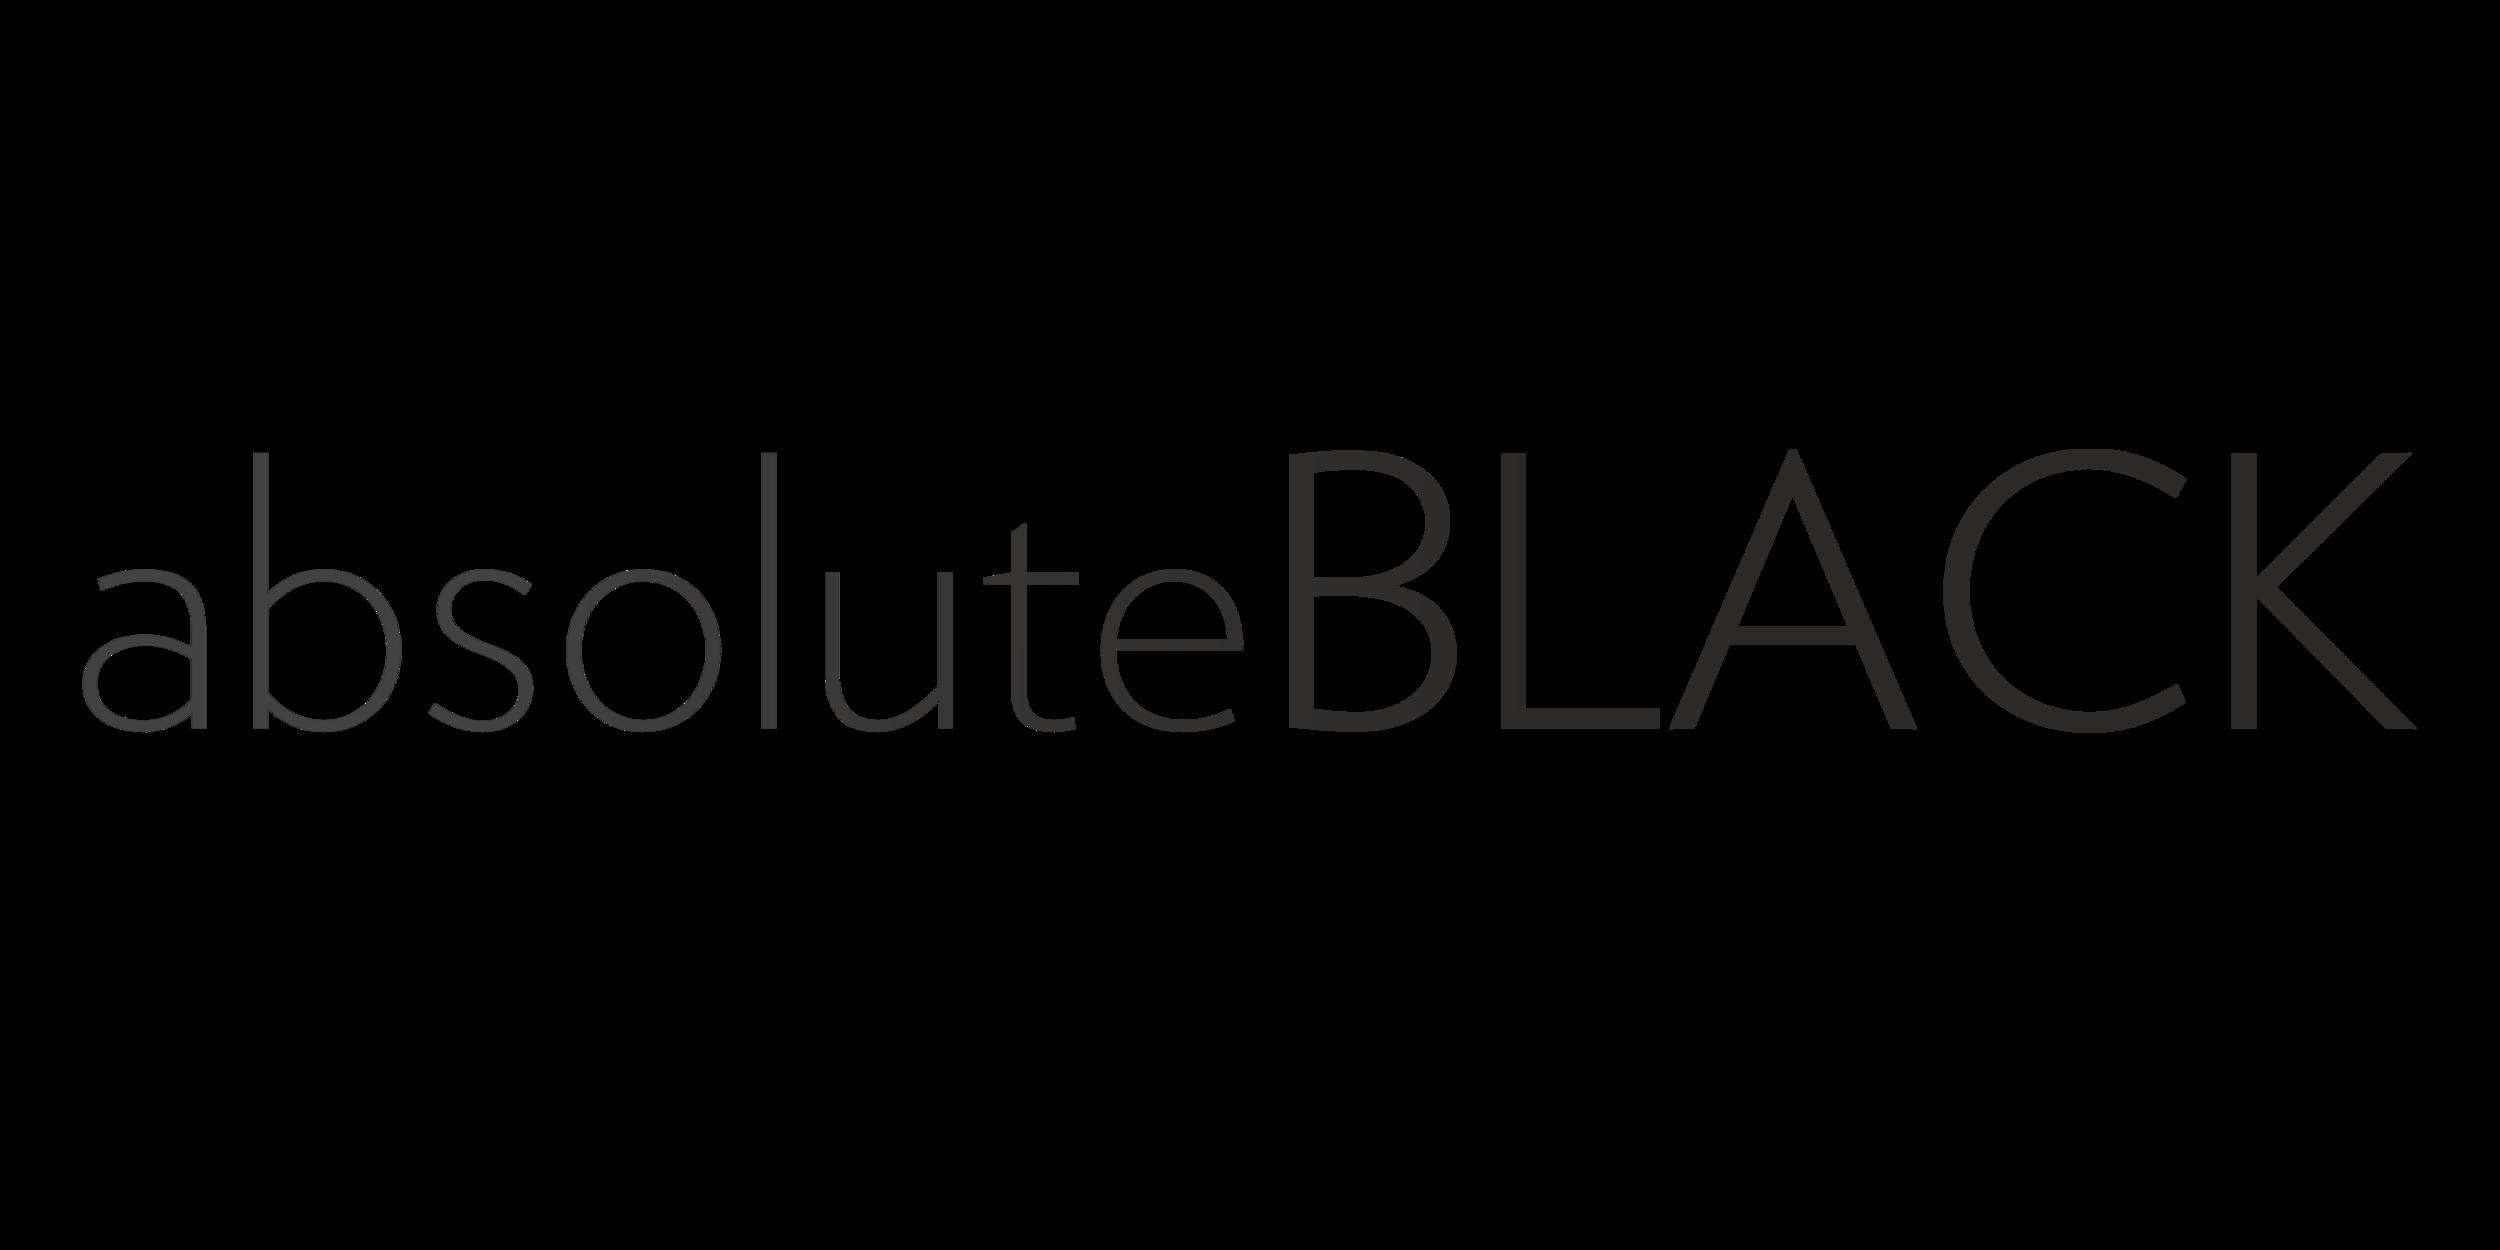 absoluteBLACK logo.png